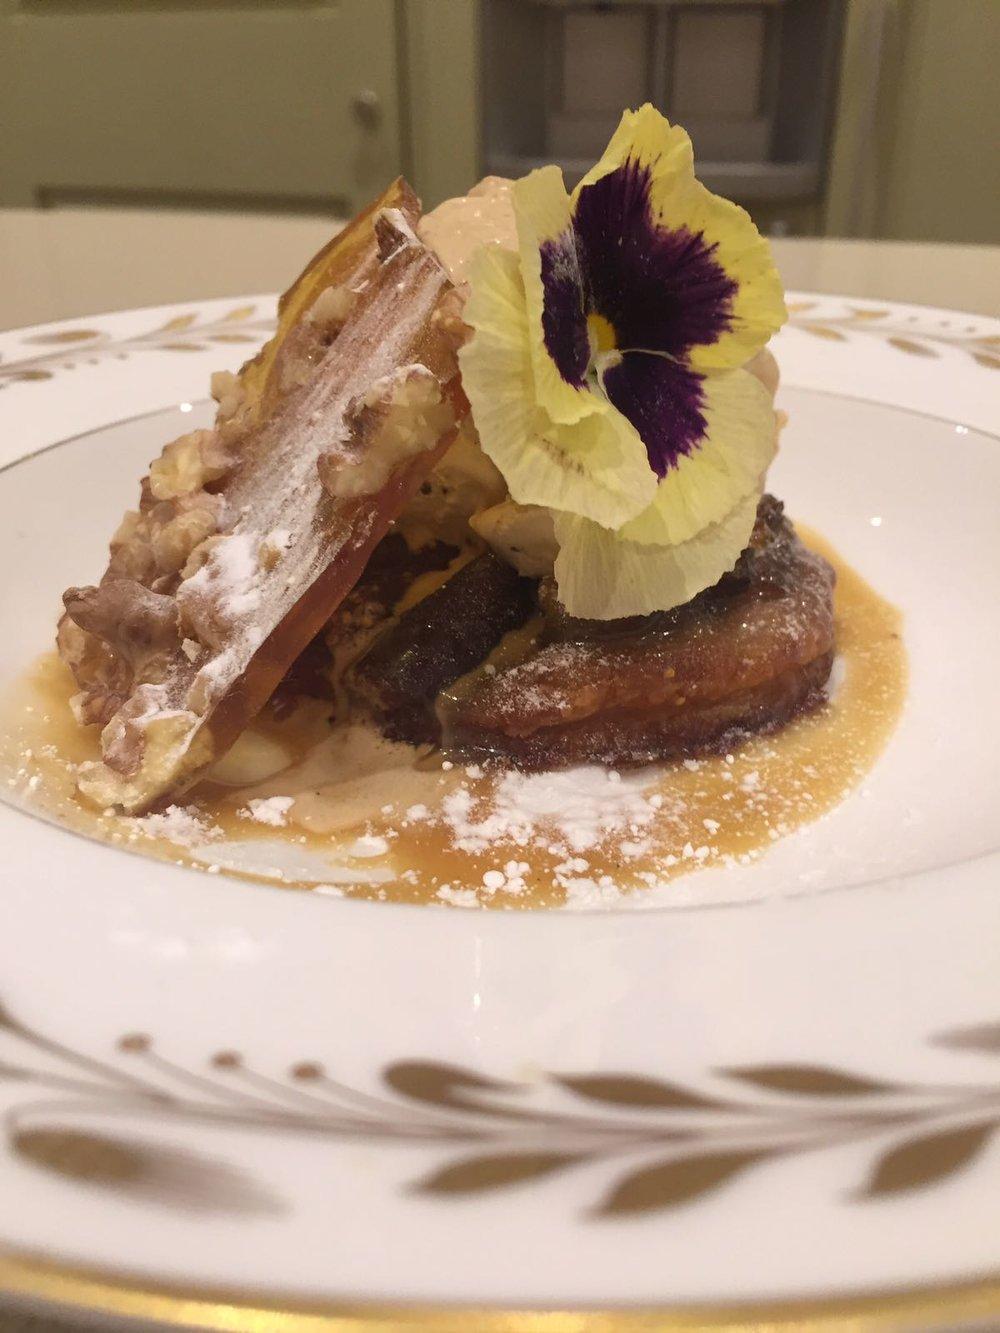 puddings-sarah-symington-catering-19.JPG